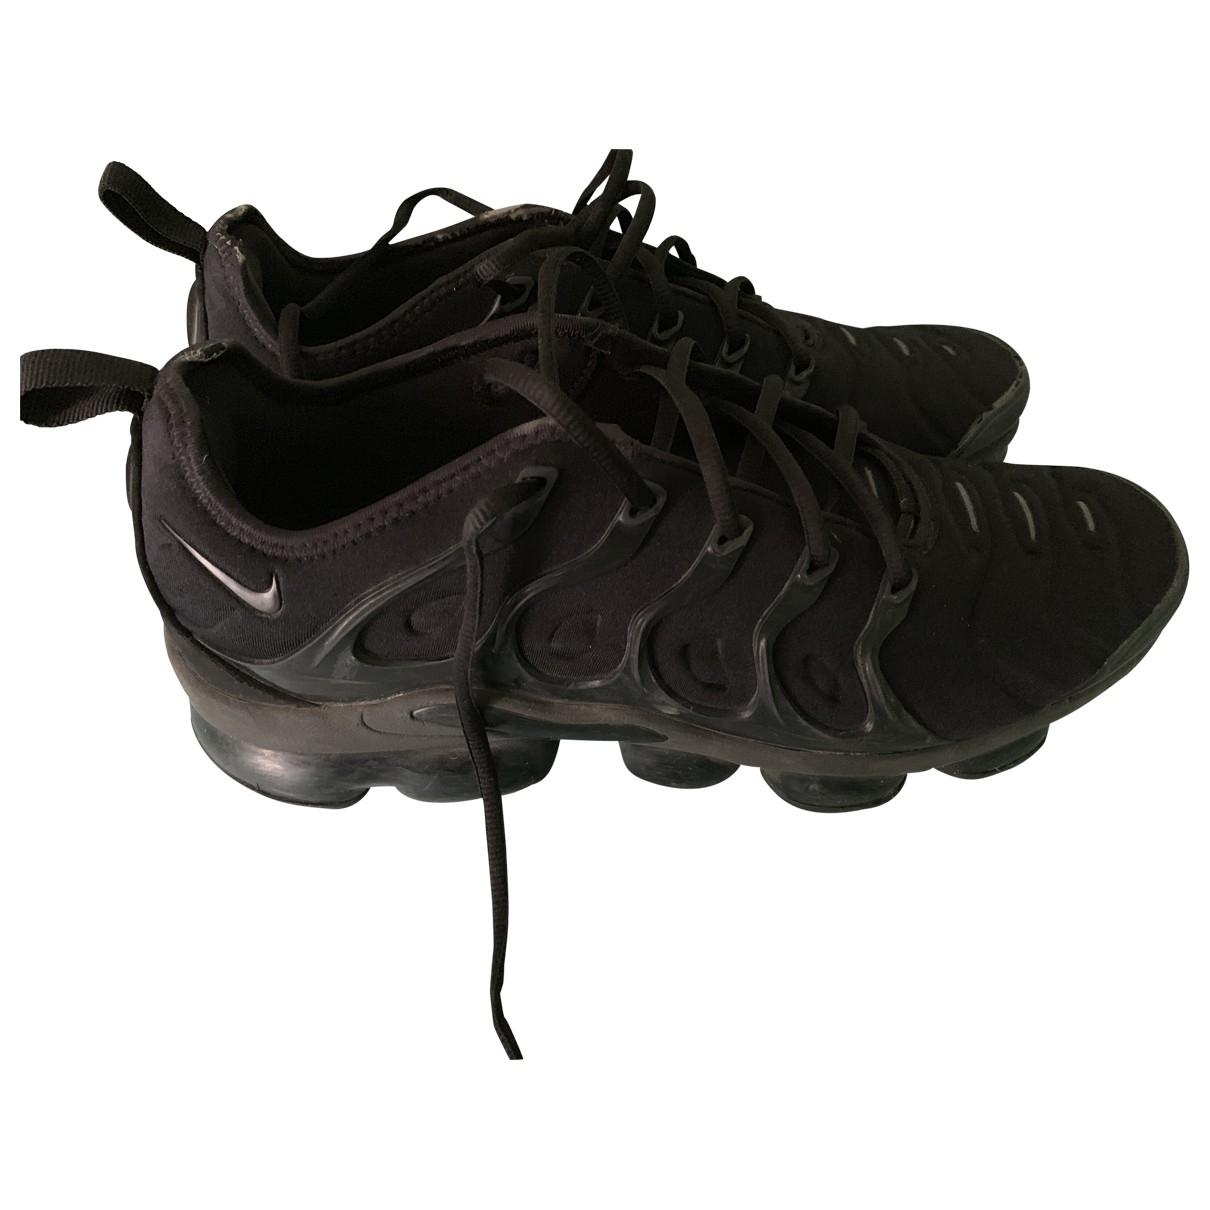 Nike VaporMax Plus Black Cloth Trainers for Men 44.5 EU